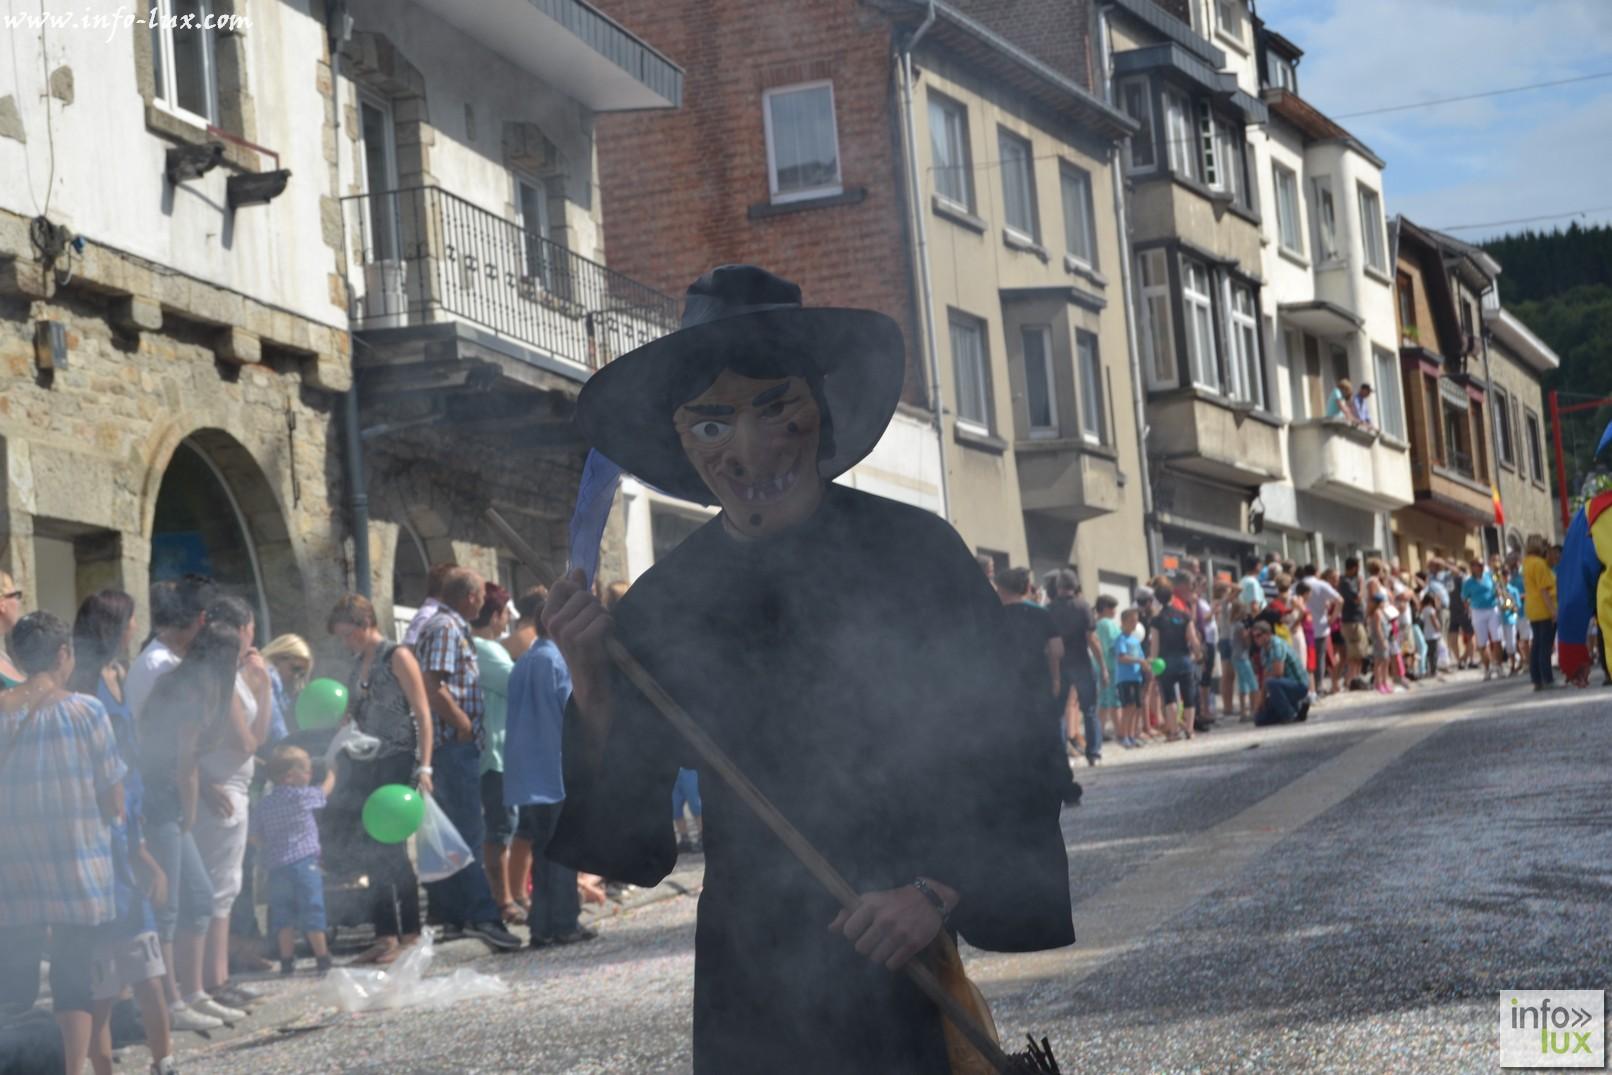 images/stories/PHOTOSREP/Houffalize/soleil1/soleillLaurent100